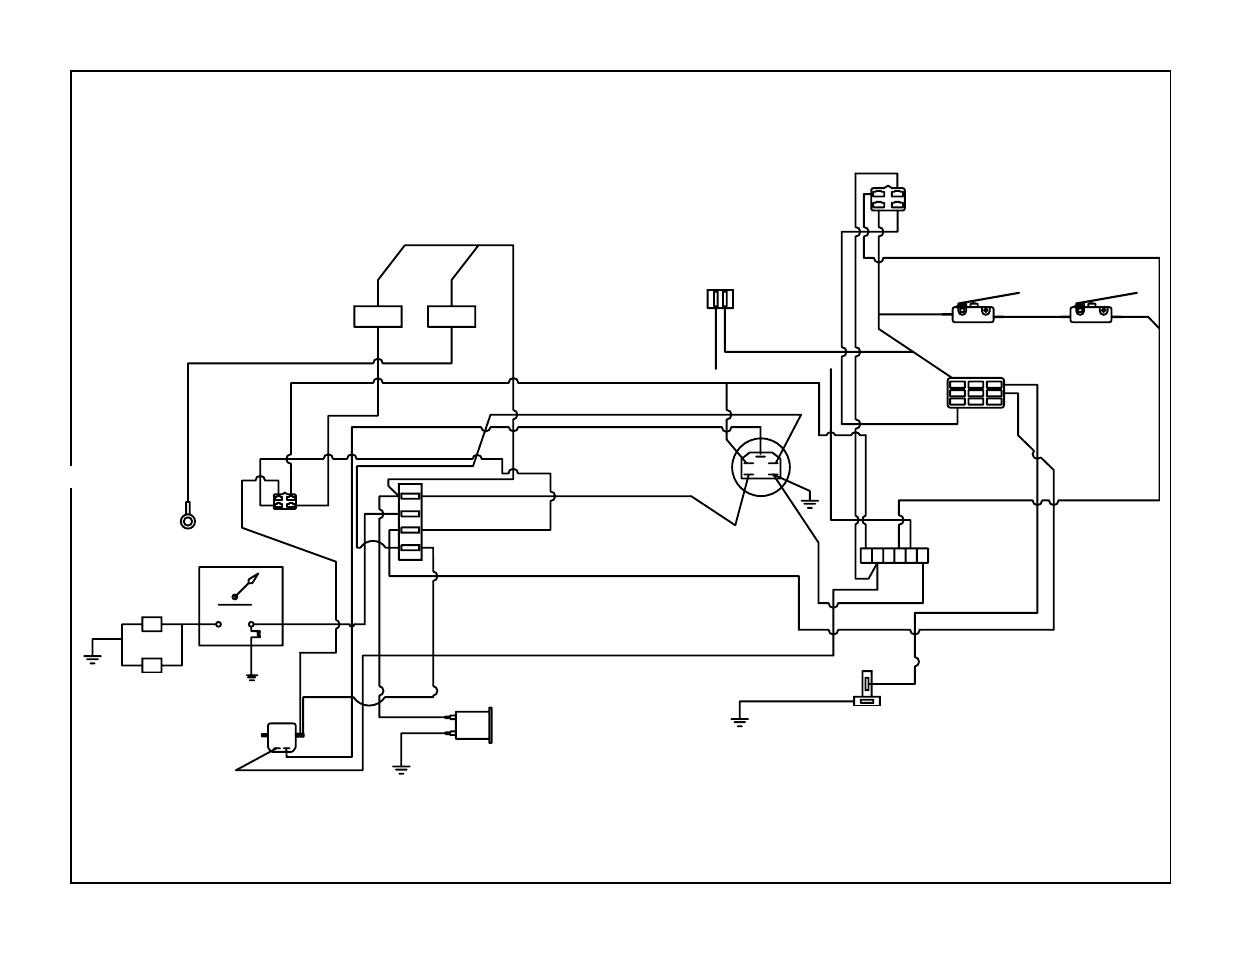 hight resolution of kohler wiring harness bush hog zero turn mowers user manual page 25 30